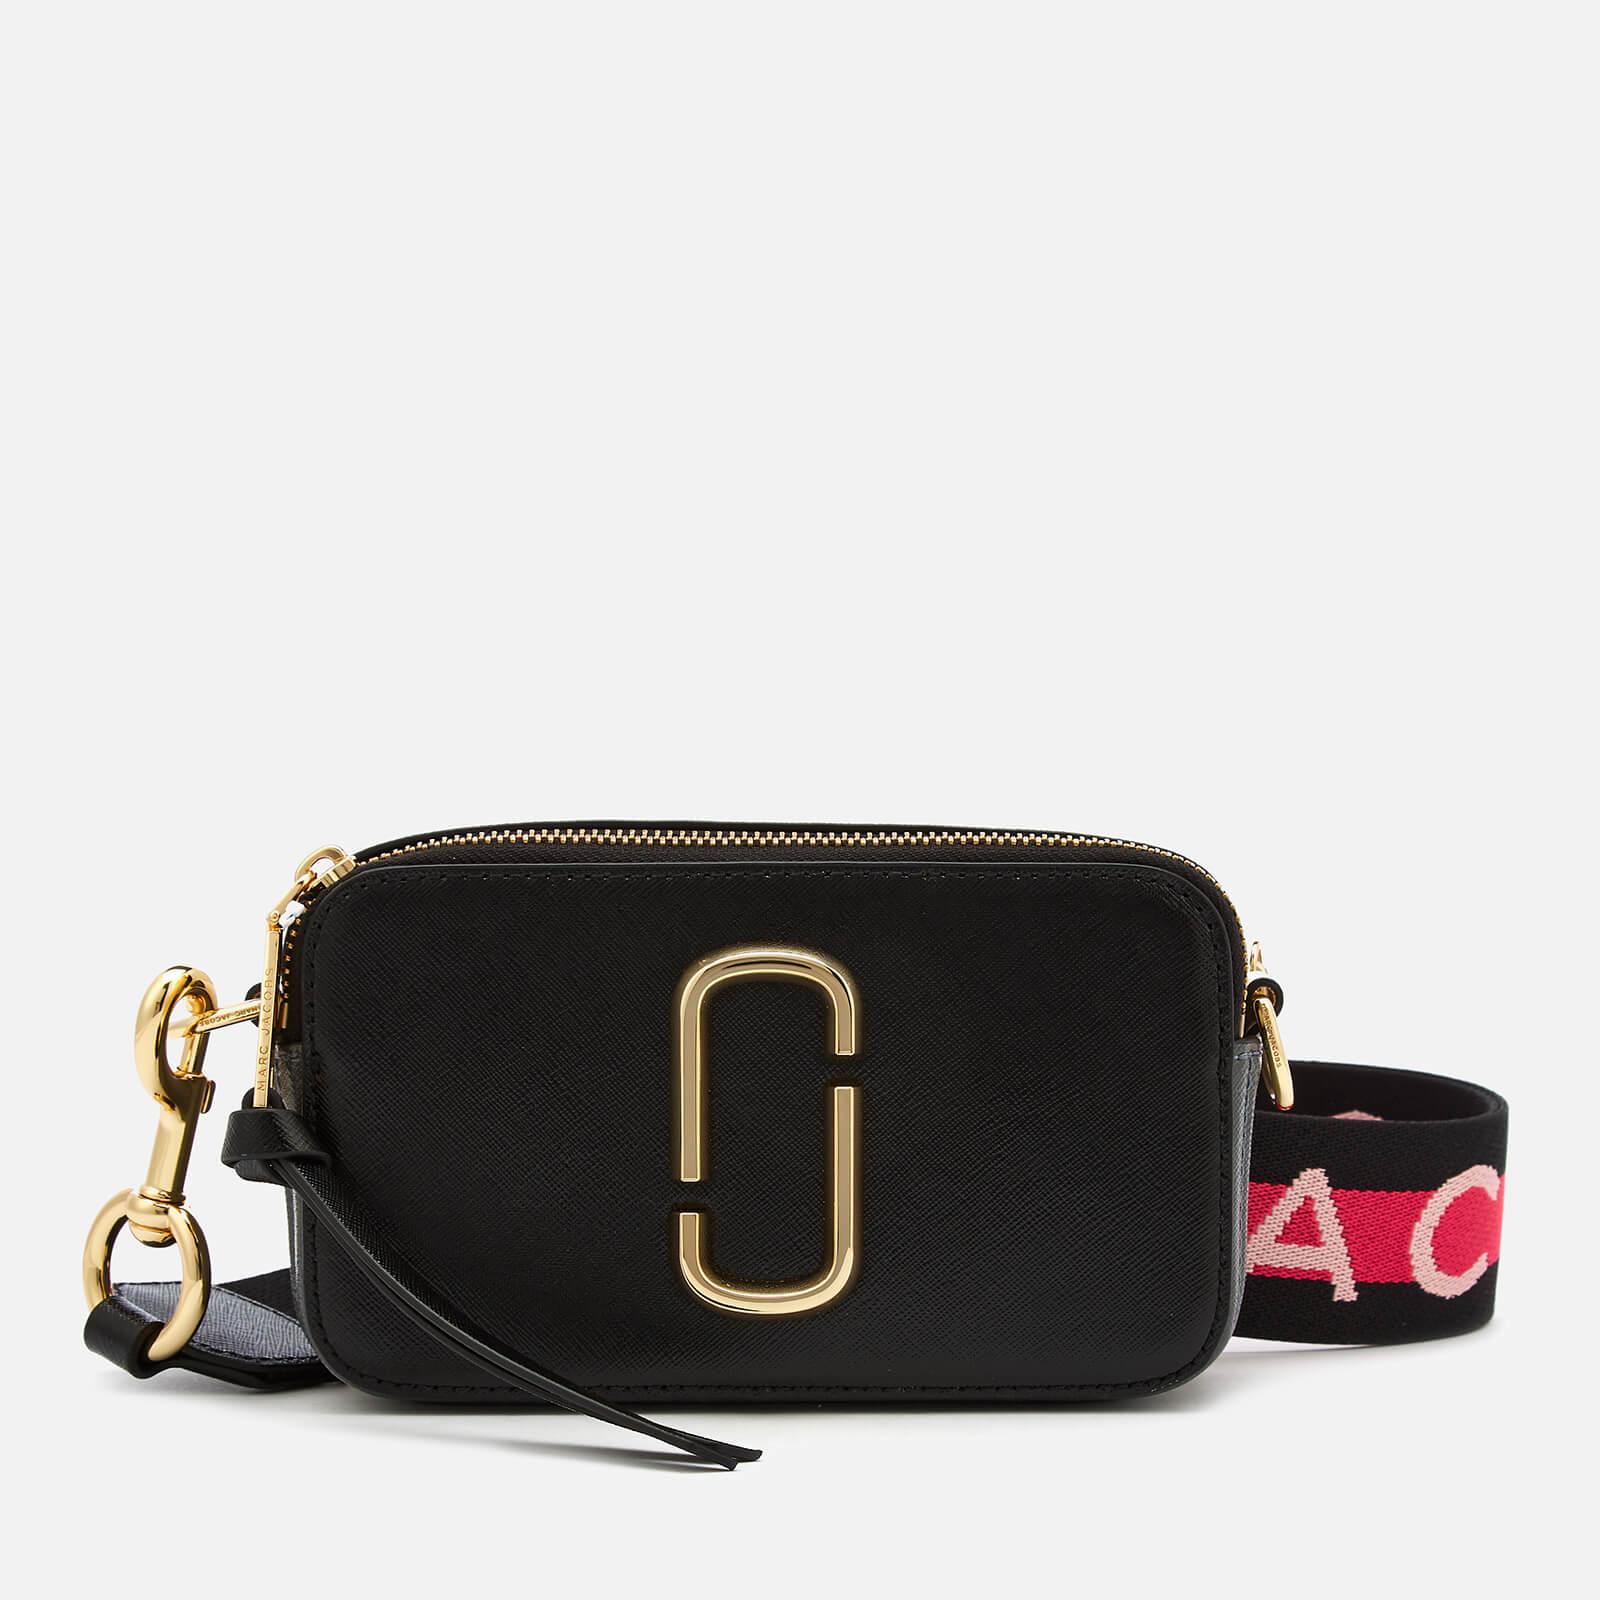 c7abadcb8 Marc Jacobs Women's Snapshot Cross Body Bag - Black Multi